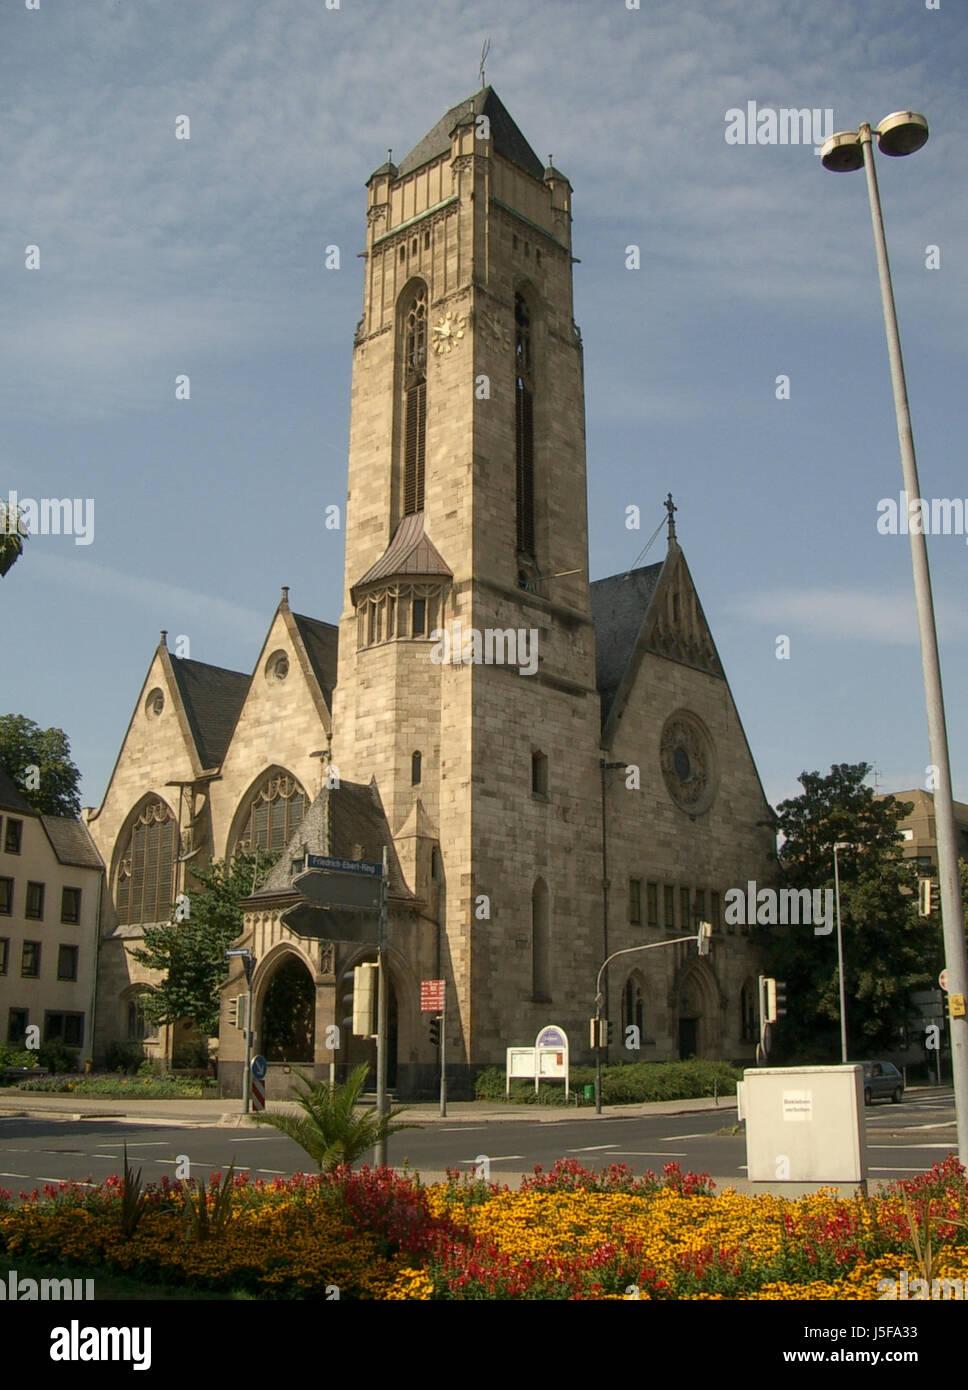 tower church coblenz christian medieval christianity steeple christuskirche Stock Photo